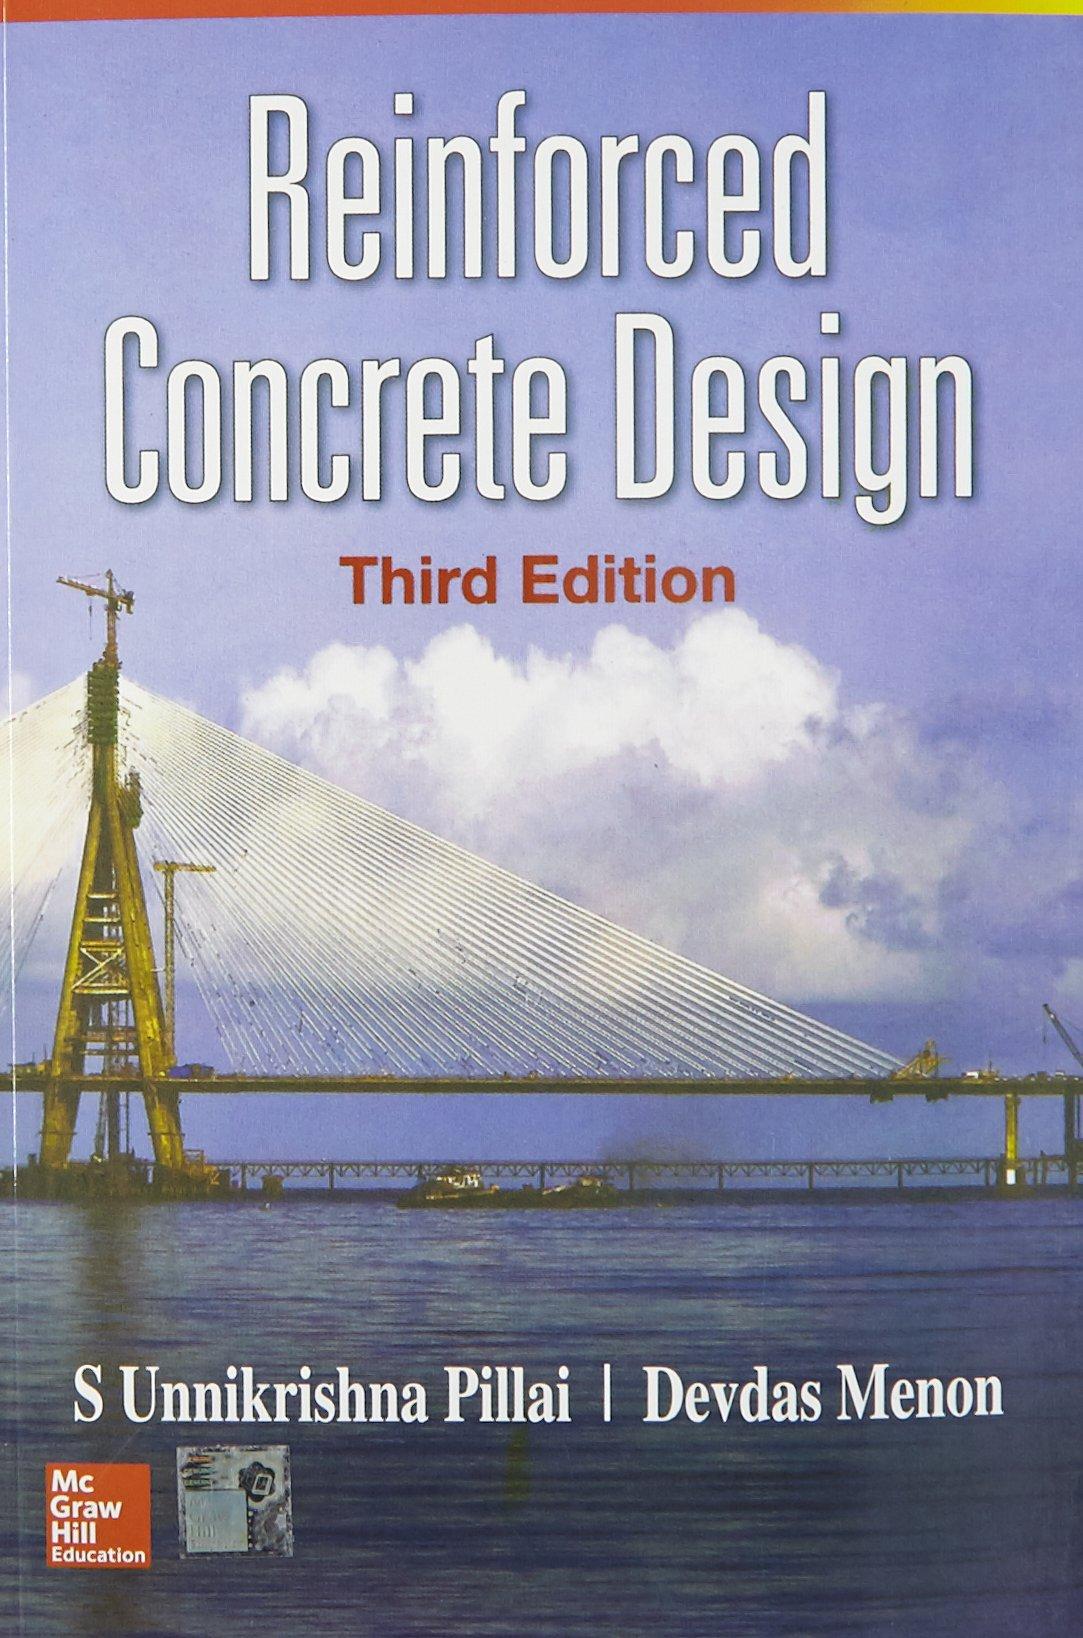 Buy Reinforced Concrete Design - Third Edition Book Online